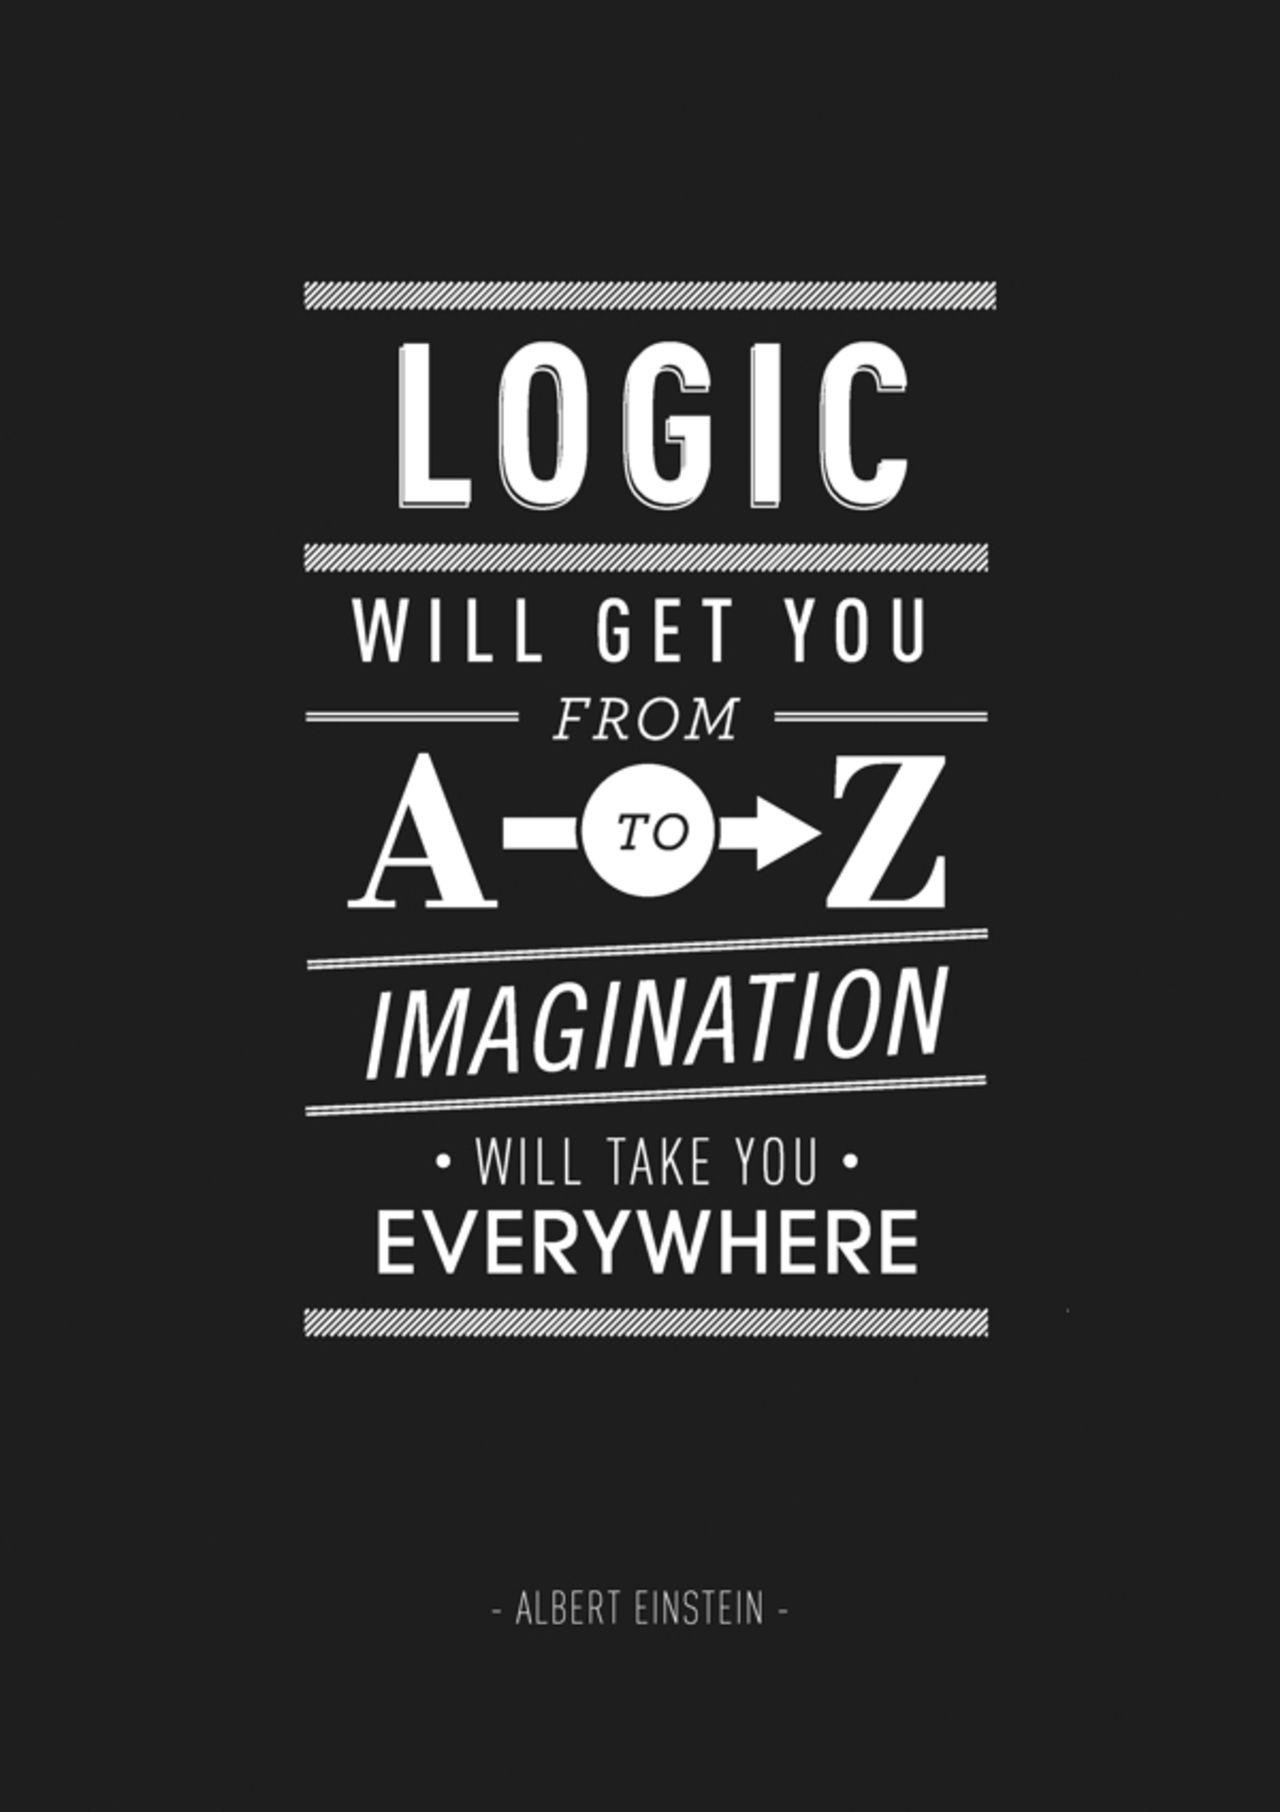 Logic Quotes Logic Vs Imagination Foodforthought  Cheer Me Up Stuff